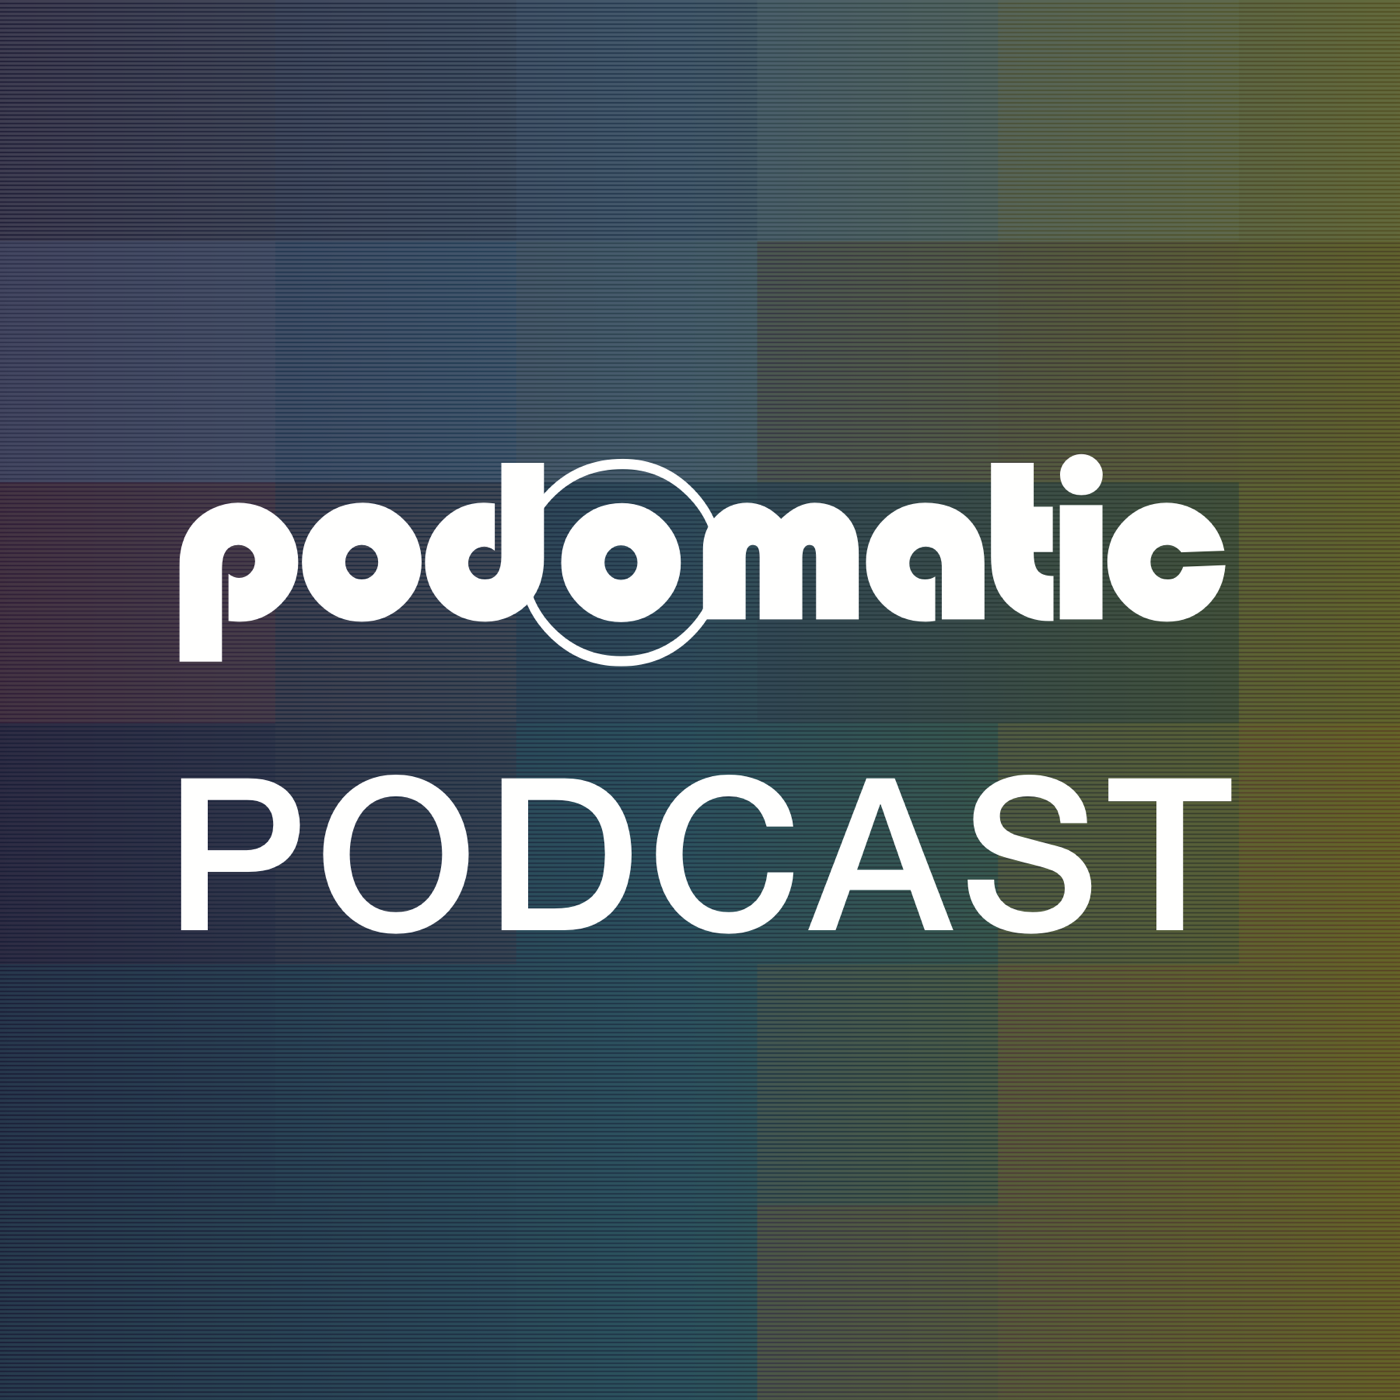 Patrick MAC's Podcast